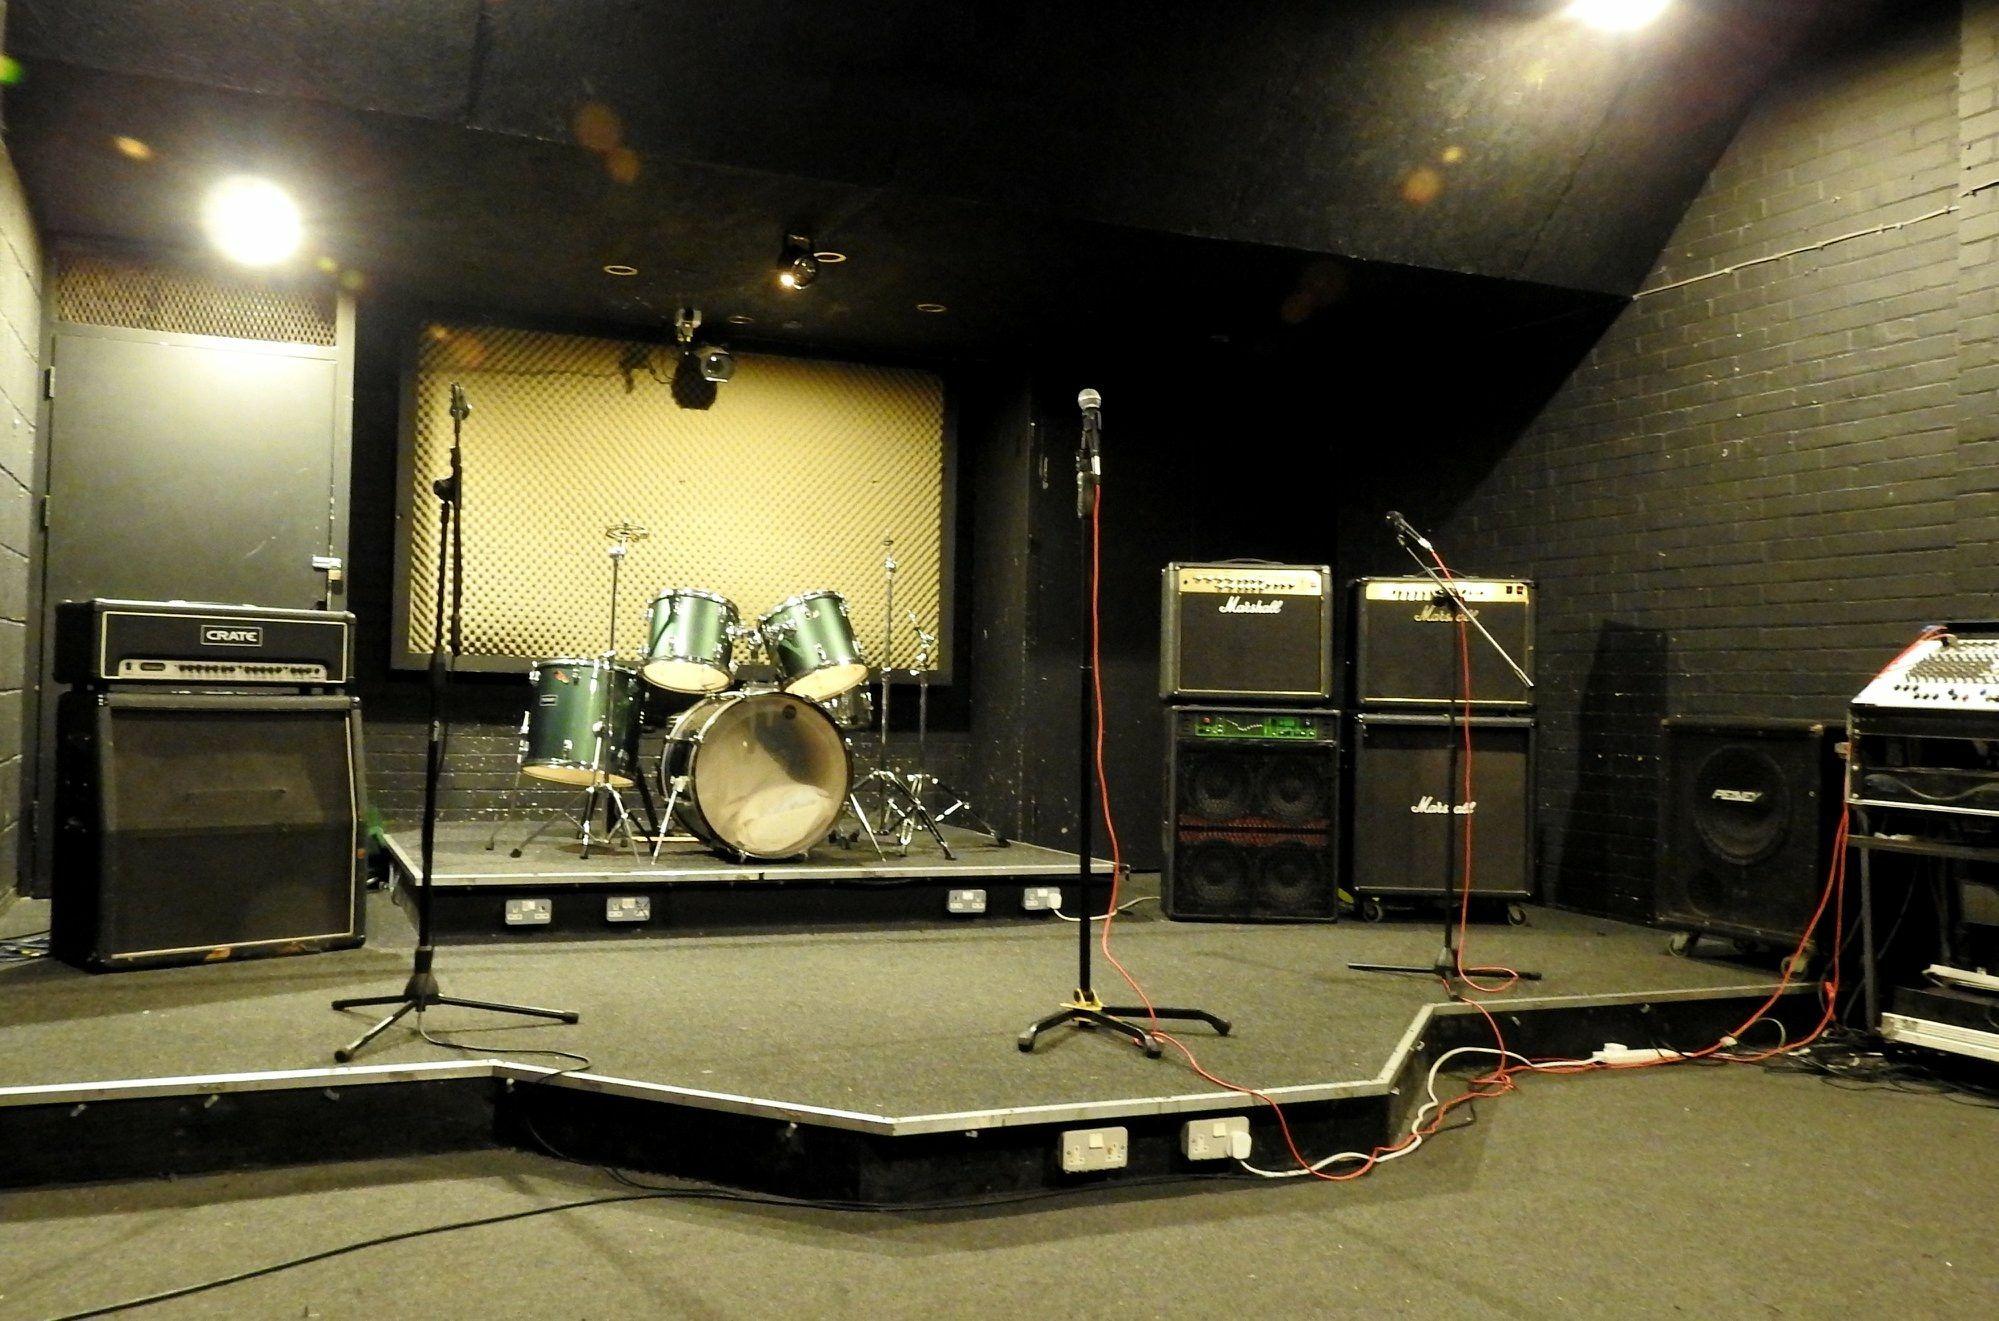 Notes Rehearsal Studio Music Studio Room Rehearsal Studios